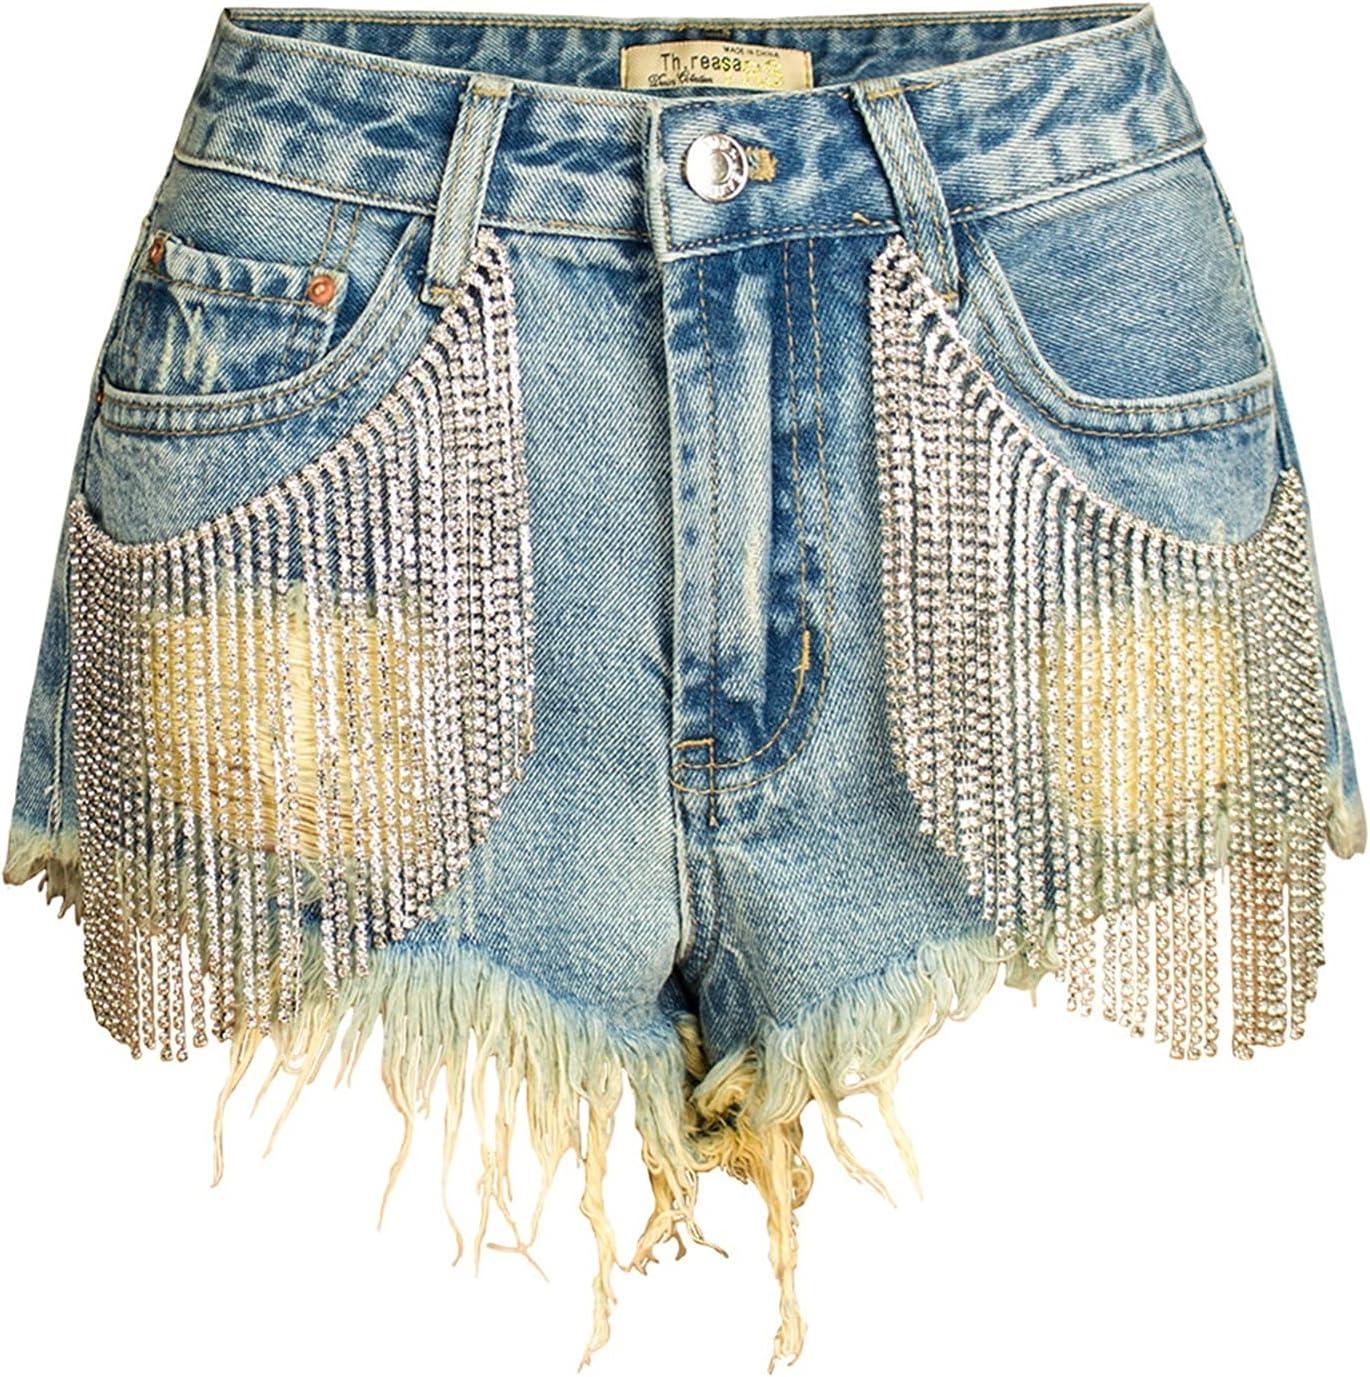 SBCDY Women's Destroyed Ripped Hole Denim Shorts Sexy Short Jeans Summer High Waist Denim Shorts Long Tassel Drill Chain Denim Shorts (Color : Blue, Size : 34)